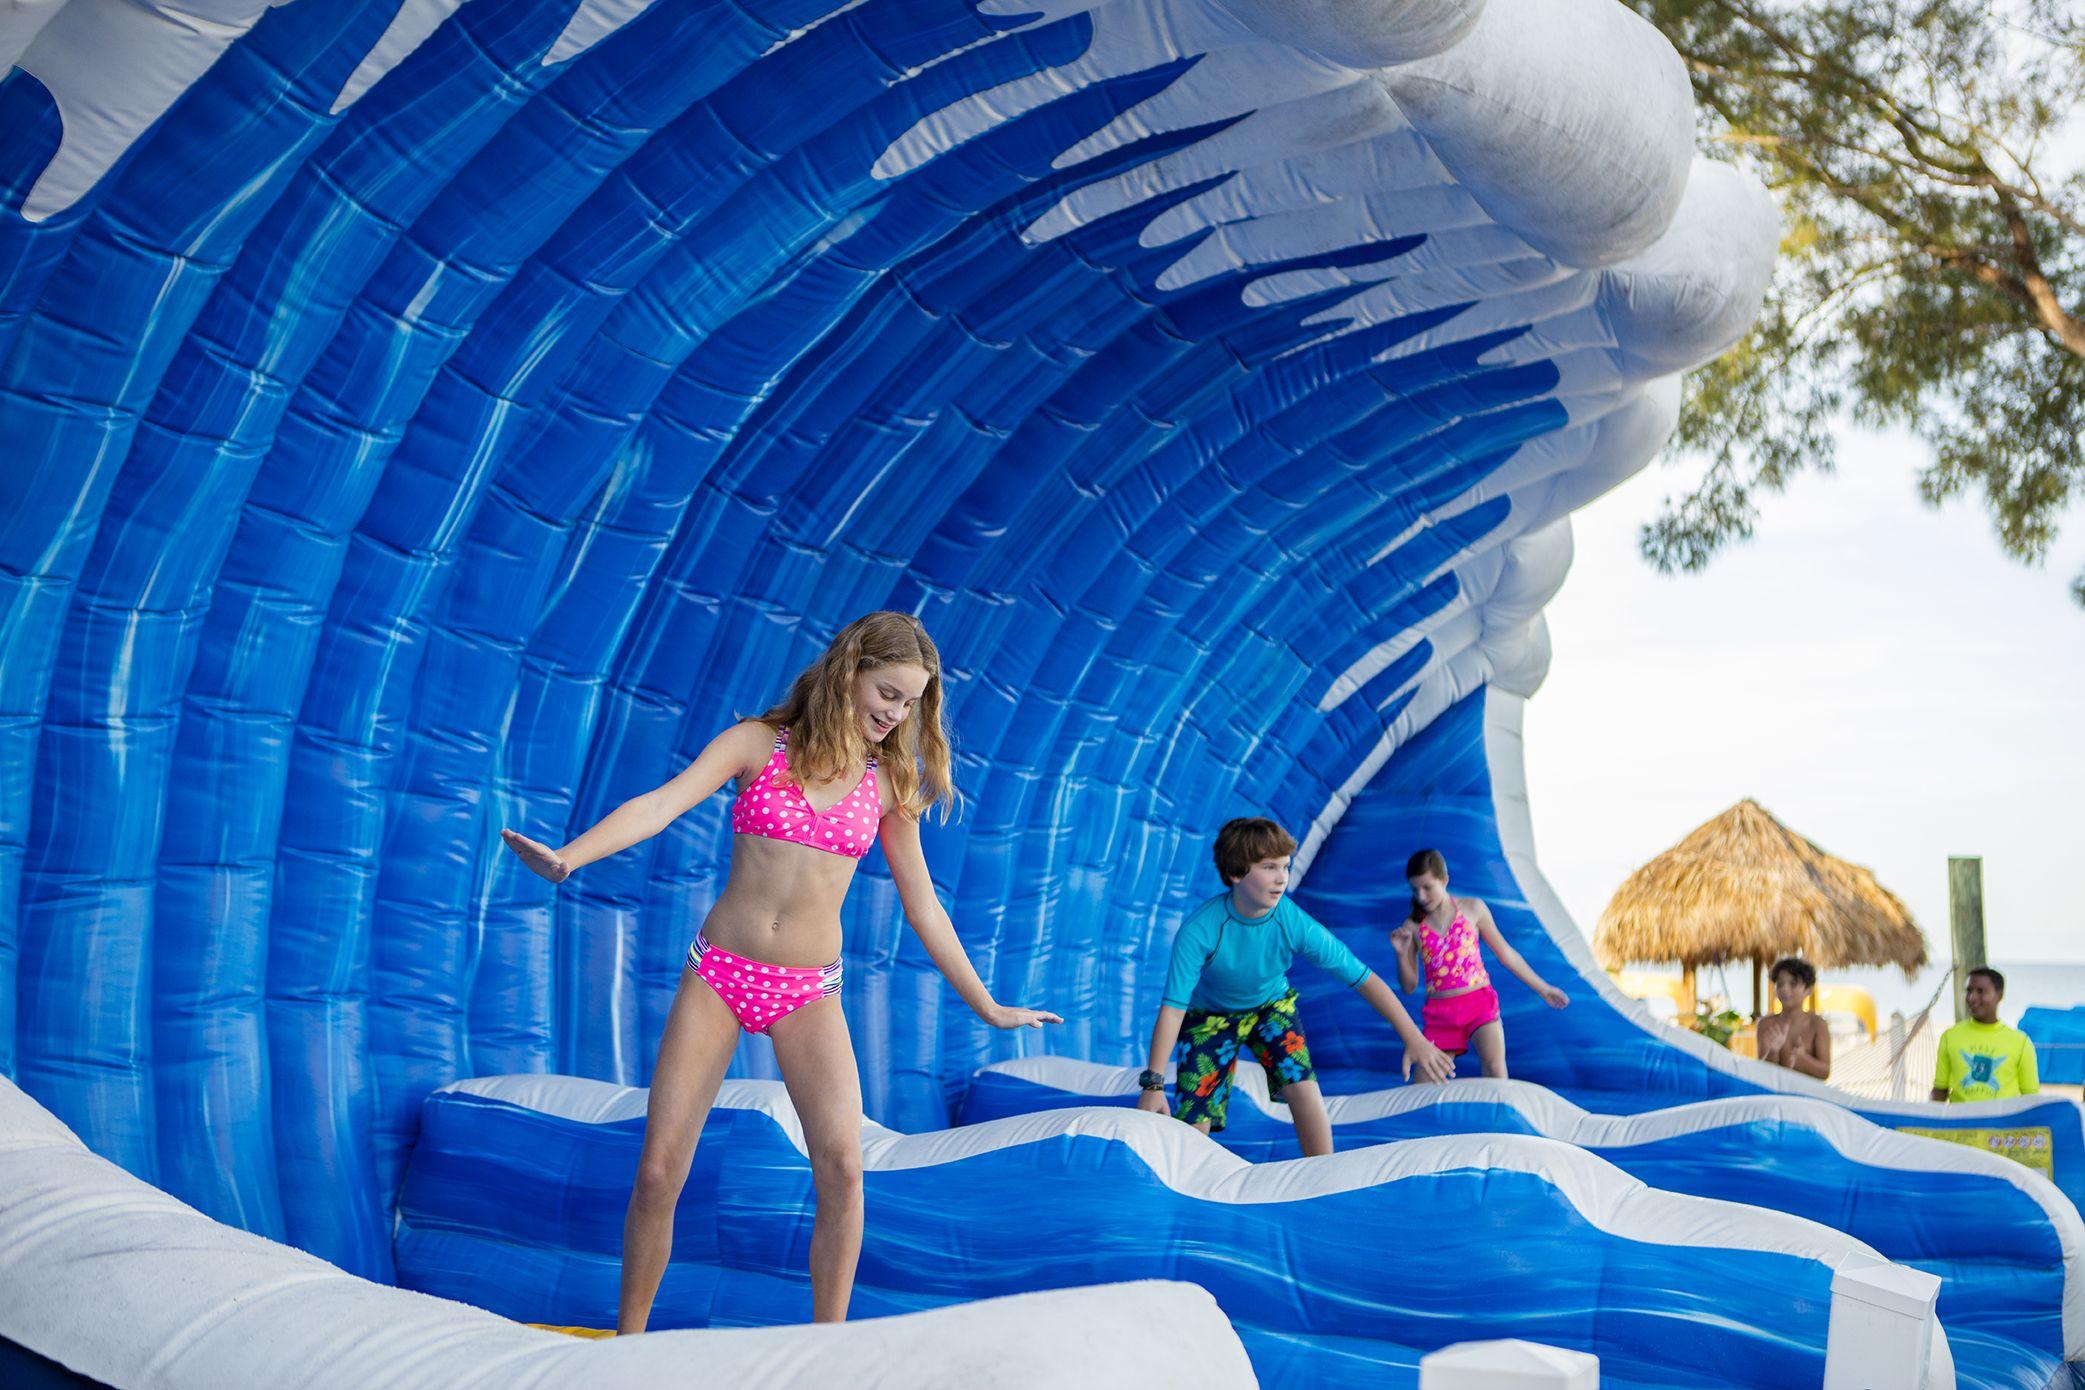 Pin By Tradewinds Island Resorts On Kid Friendly Fun Florida Family Vacation Beach Activities Florida Holiday